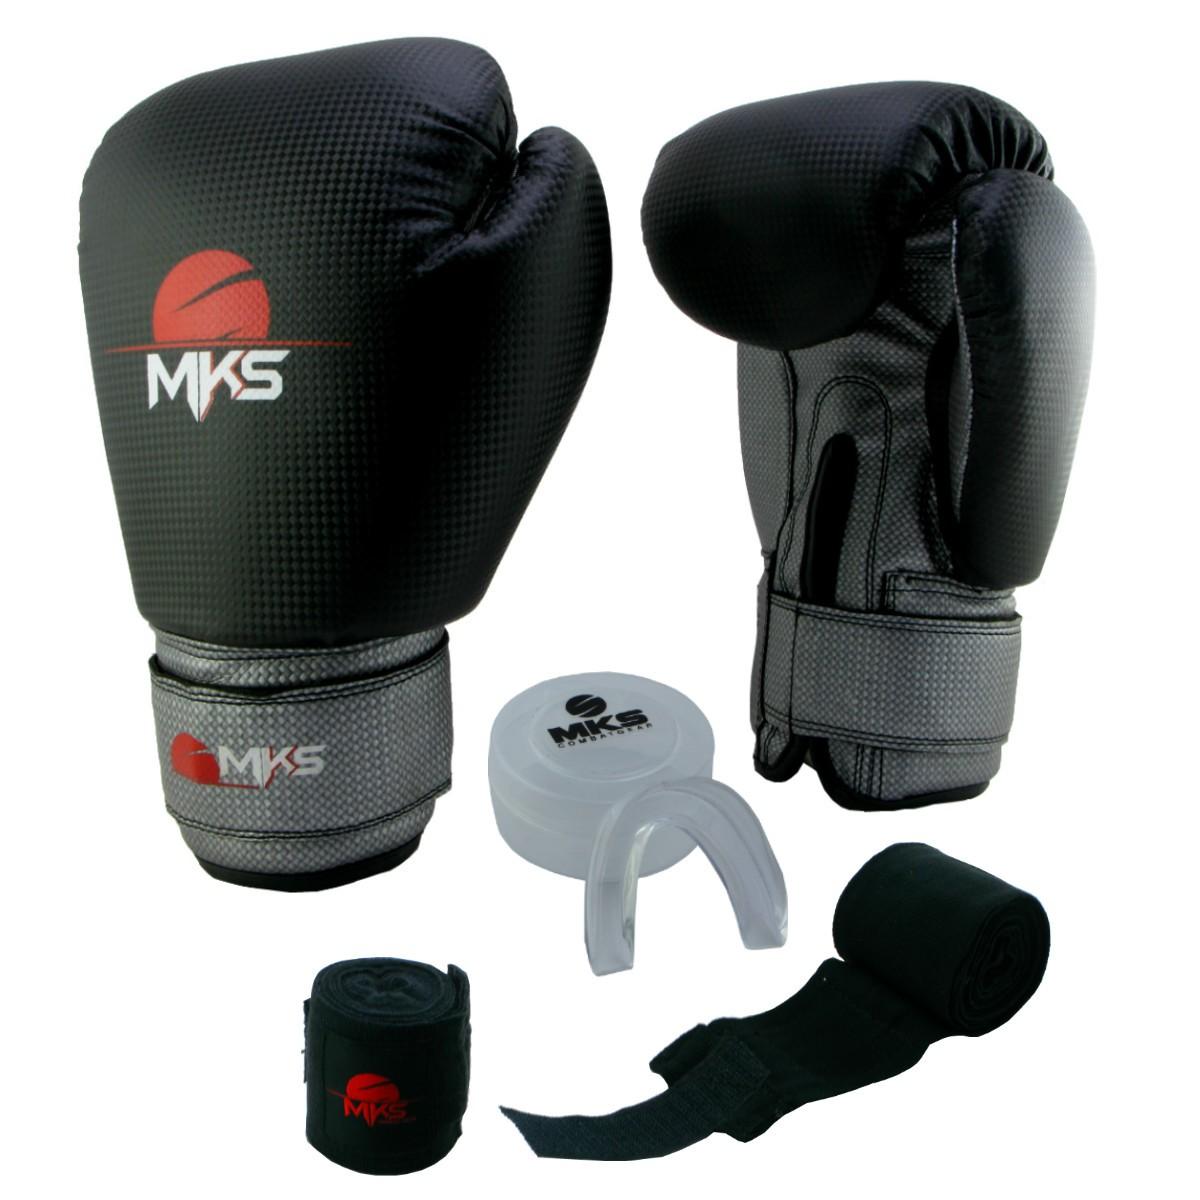 Luva de Boxe Prospect MKS Black & Silver 14 oz + Protetor Bucal + Bandagem